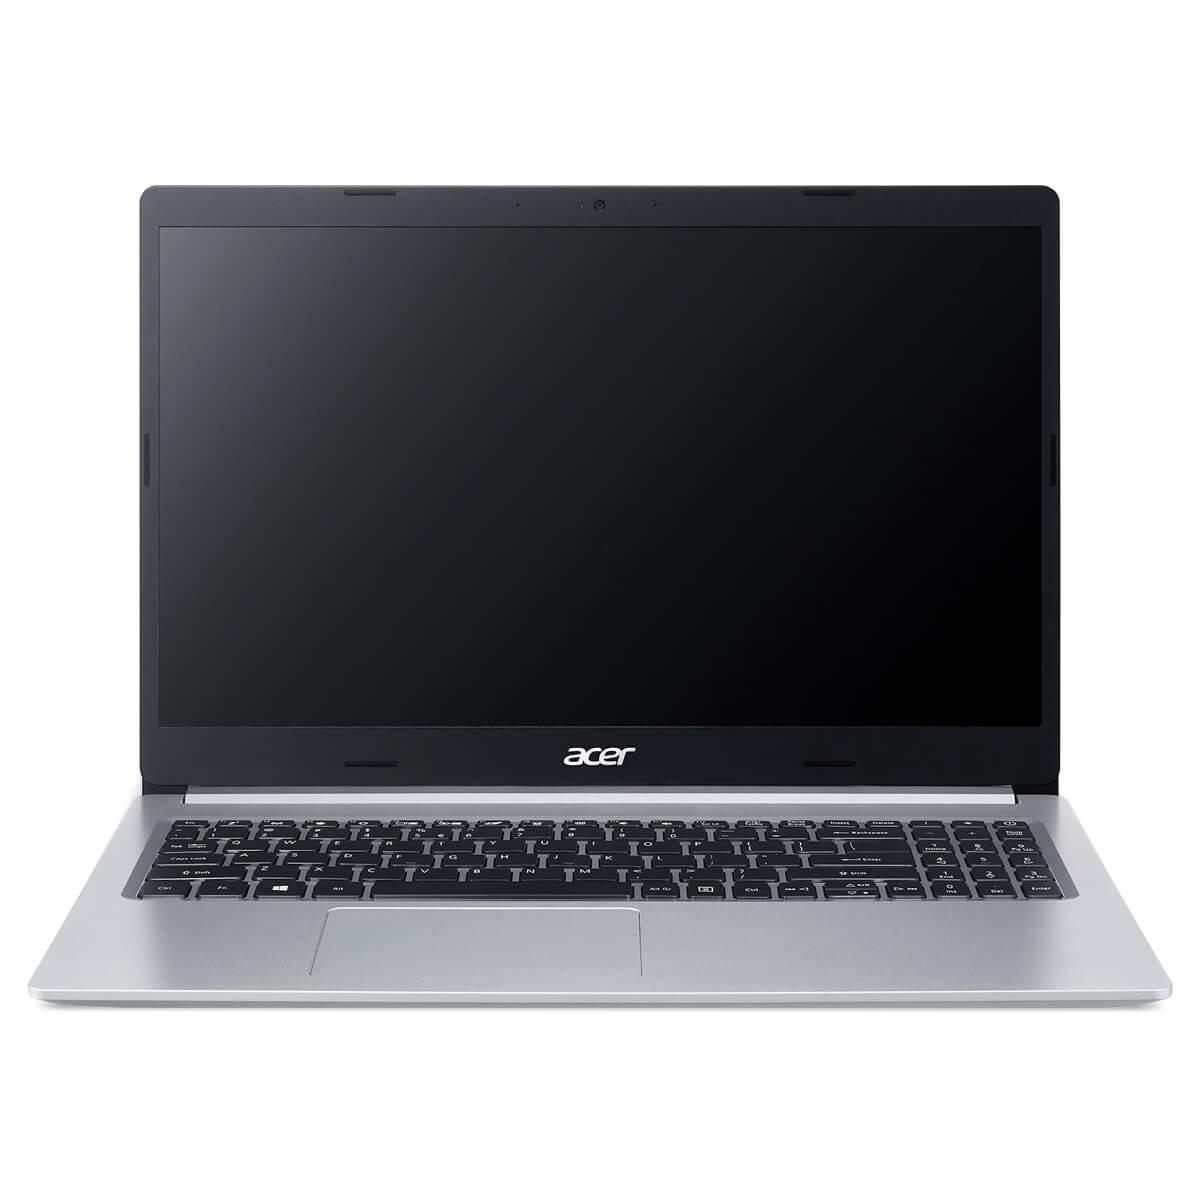 "Notebook - Acer A515-56-327t I3-1115g4 3.00ghz 4gb 256gb Ssd Intel Hd Graphics Windows 10 Home Aspire 5 15,6"" Polegadas"